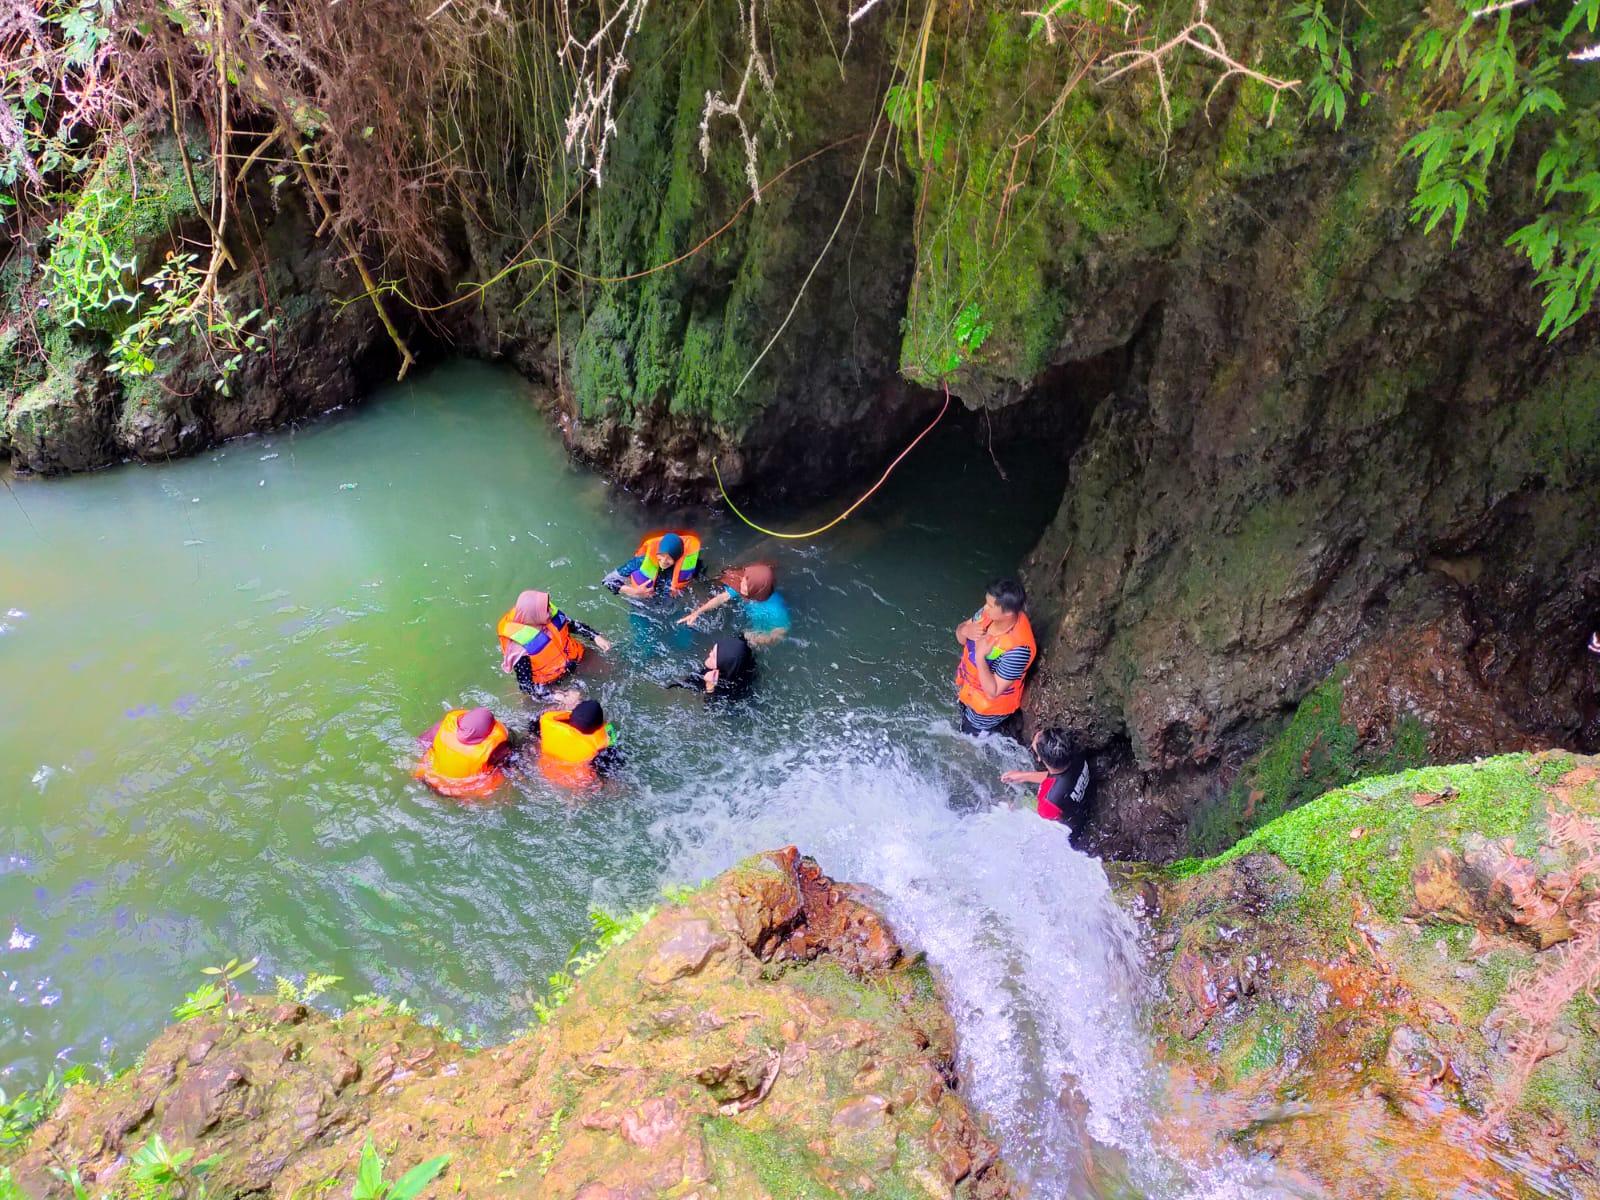 Pemuda Desa Koto Masjid Wujudkan Wisata Air Terjun Sungai Gagak Dalam Kurun Waktu 2 Tahun